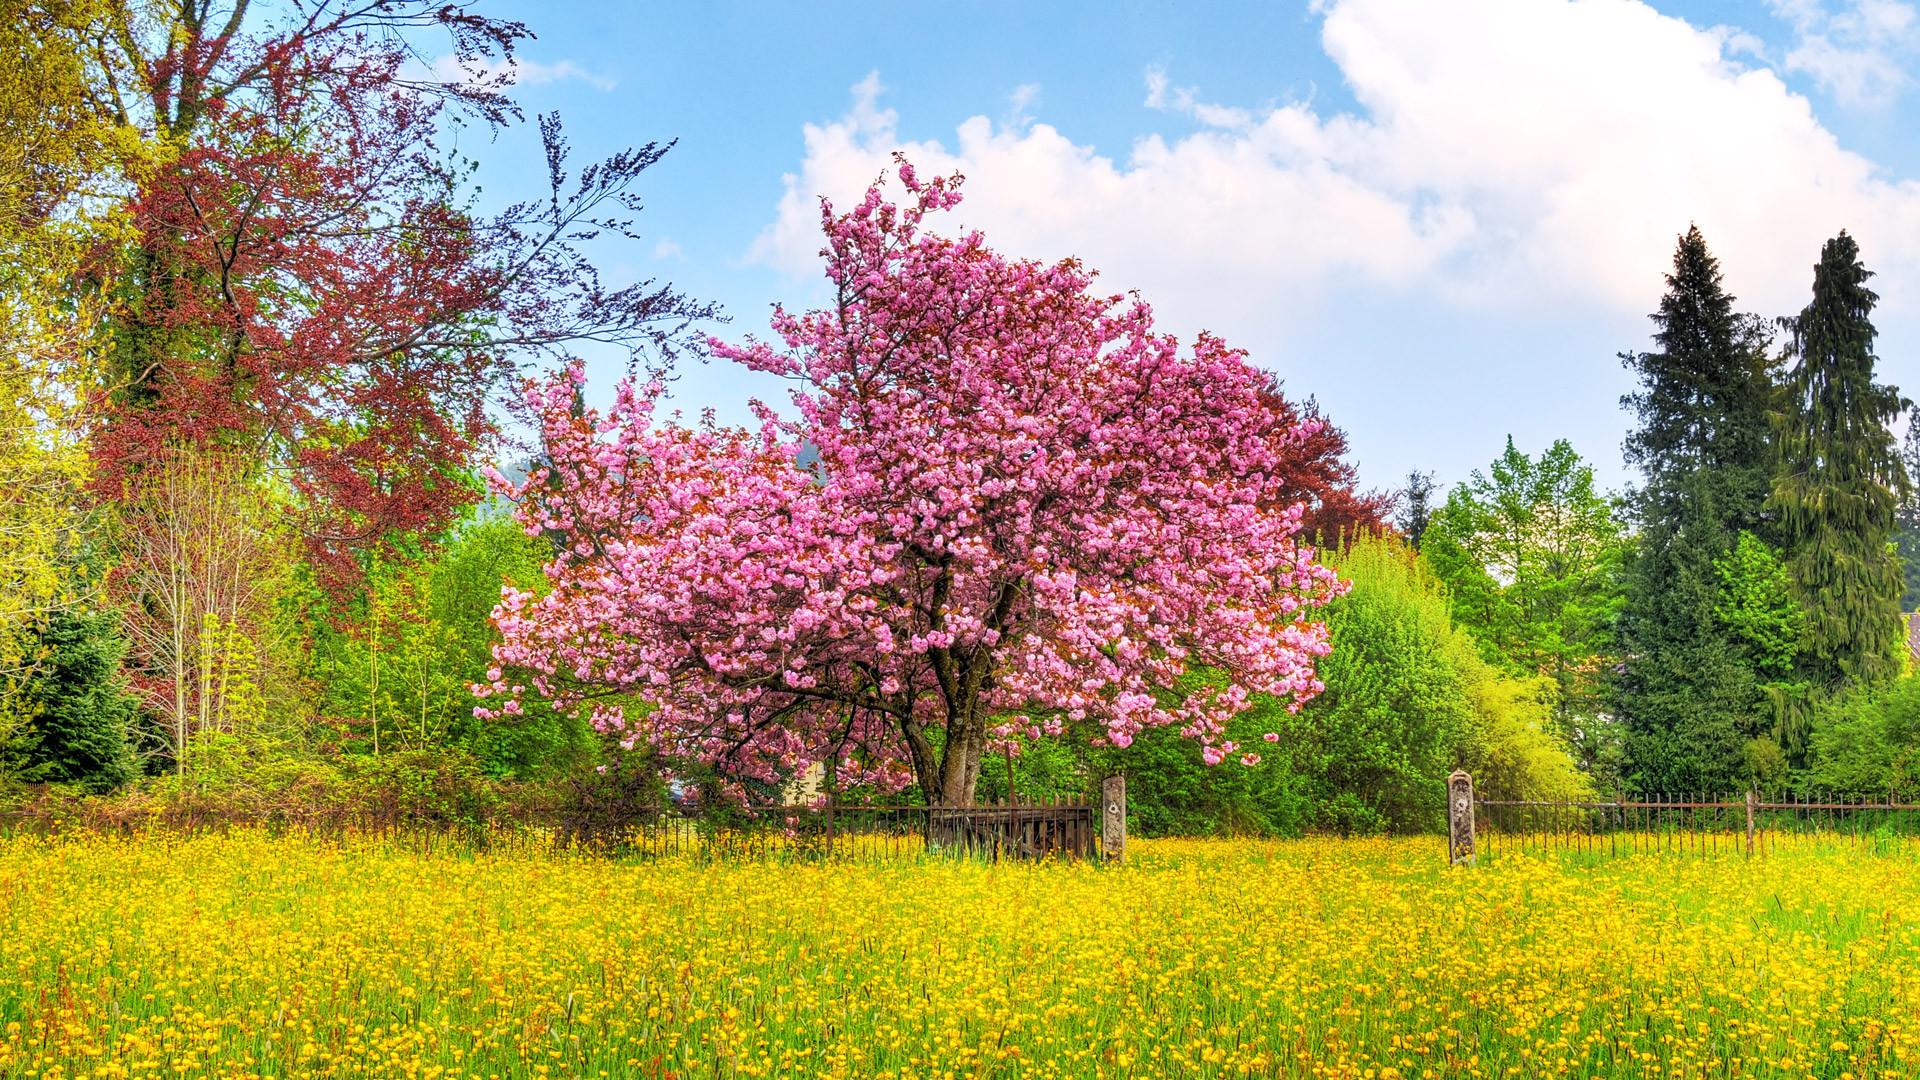 HD 1080p Wallpaper Nature.